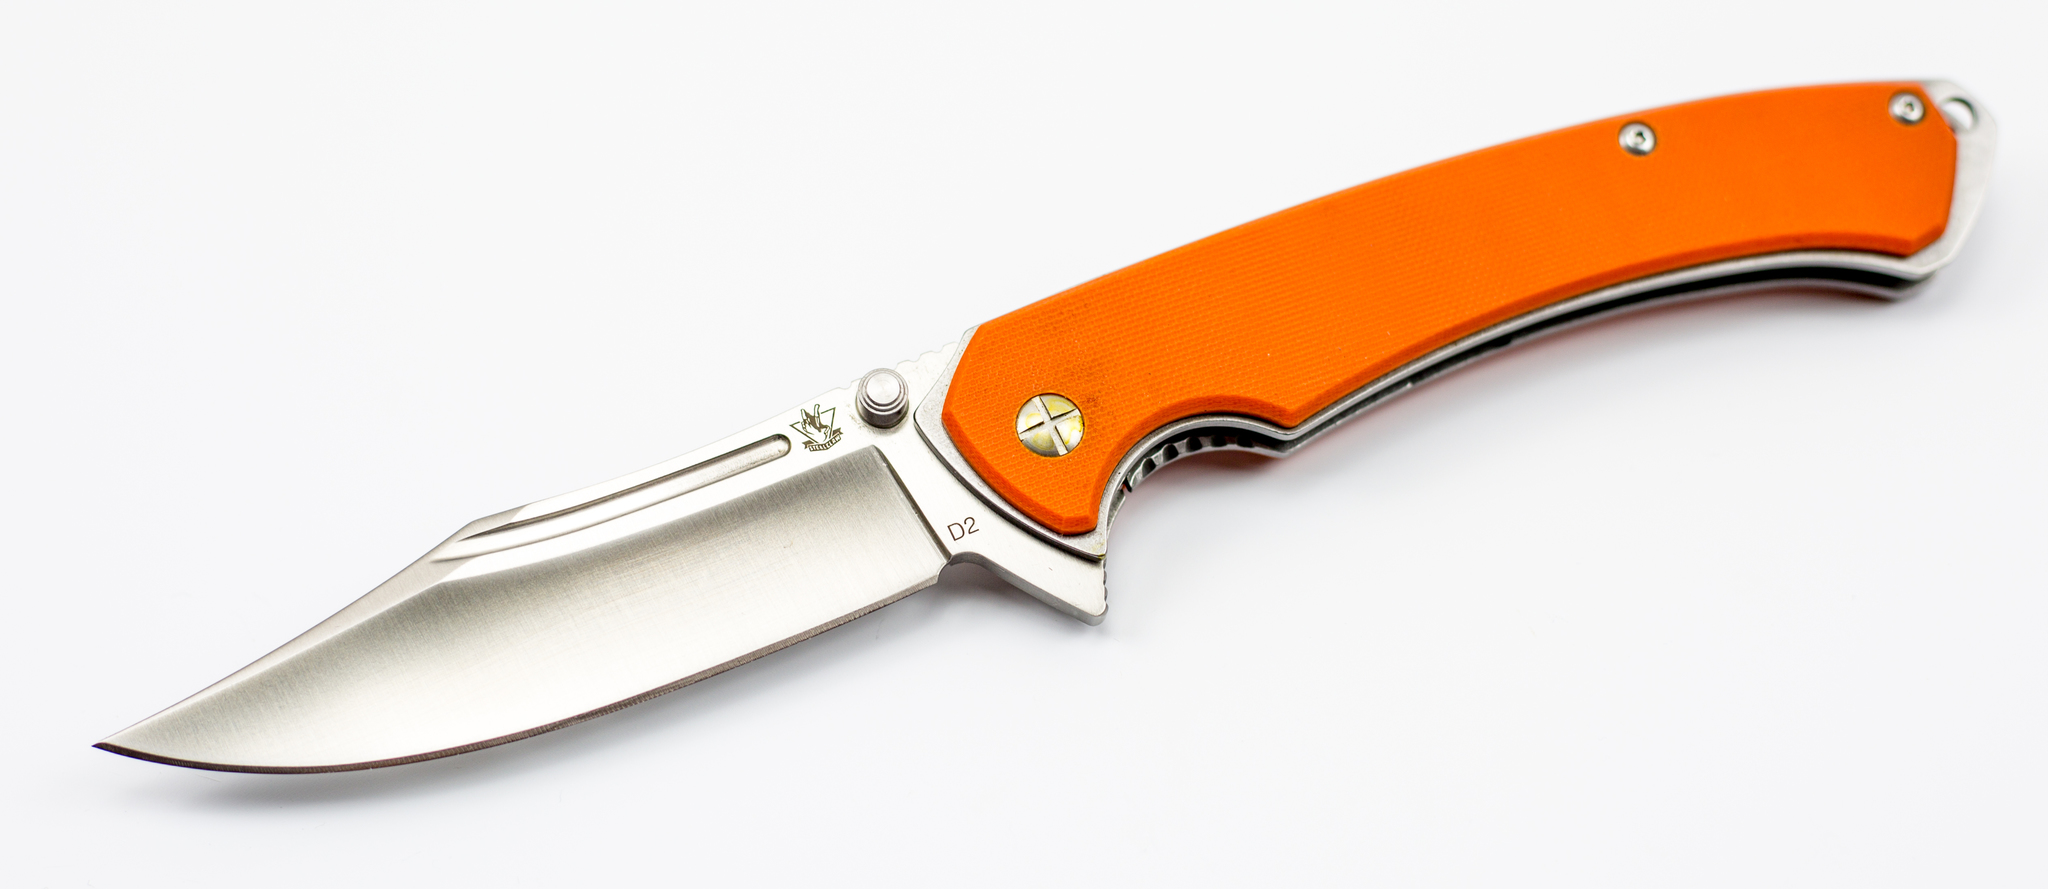 Фото 3 - Складной нож Лед-3, сталь D2 от Steelclaw